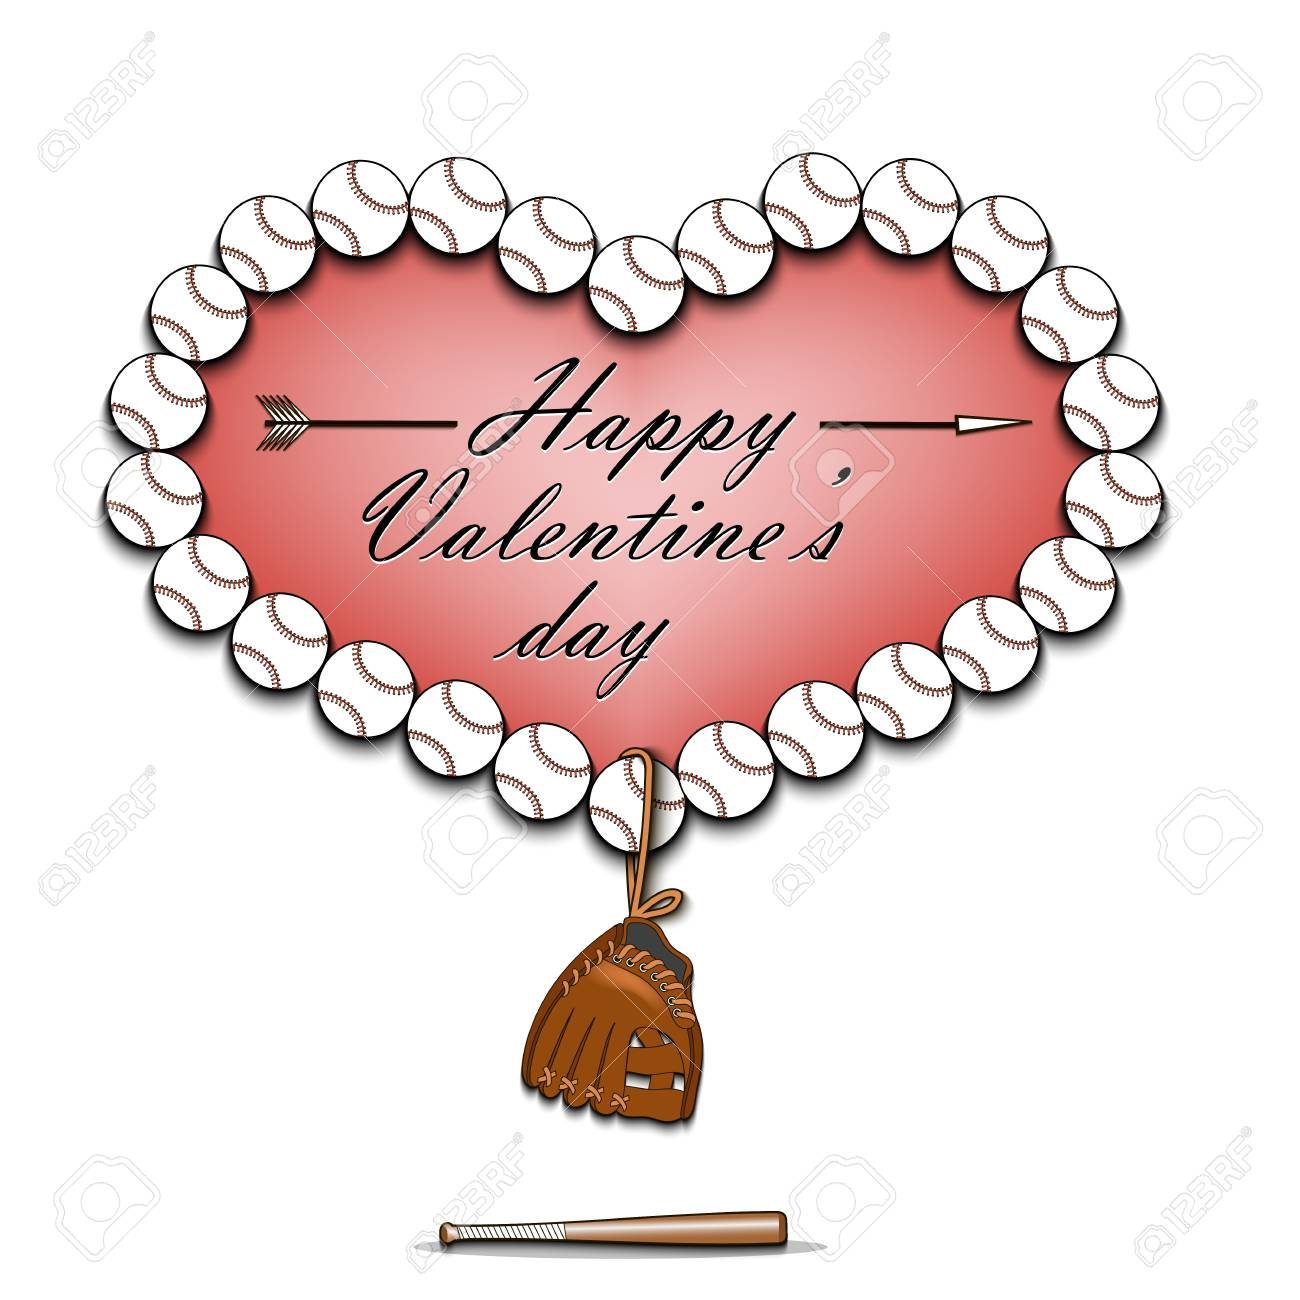 happy valentines day heart from baseball balls dangling baseball rh 123rf com Baseball Bat Clip Art Vector Baseball Bat and Ball